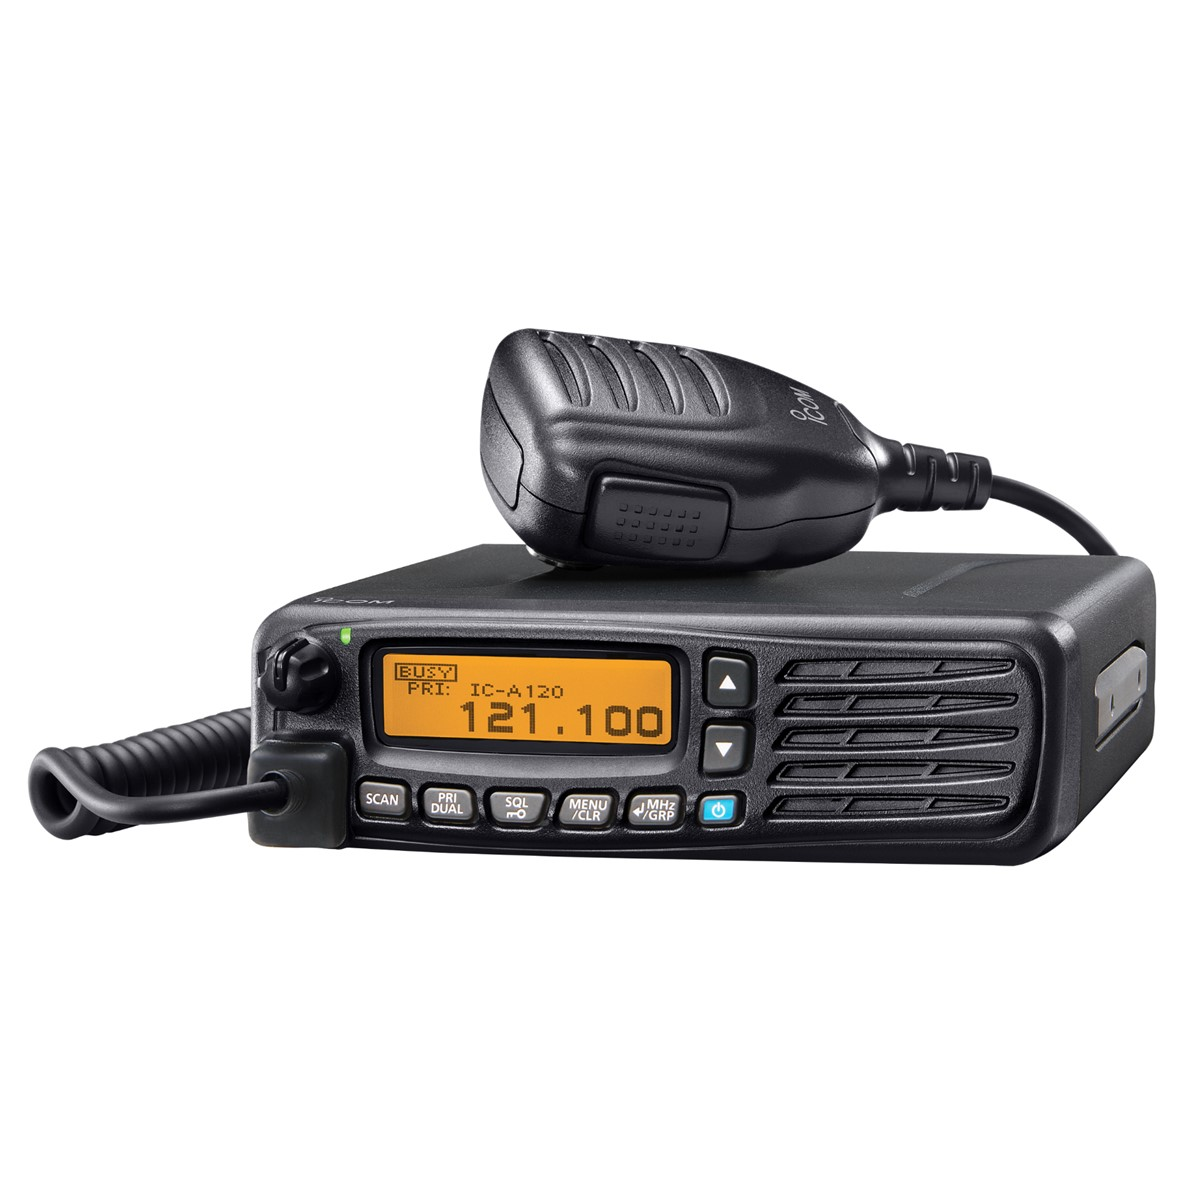 Radio Icom IC-A120 Analógico IC-A120